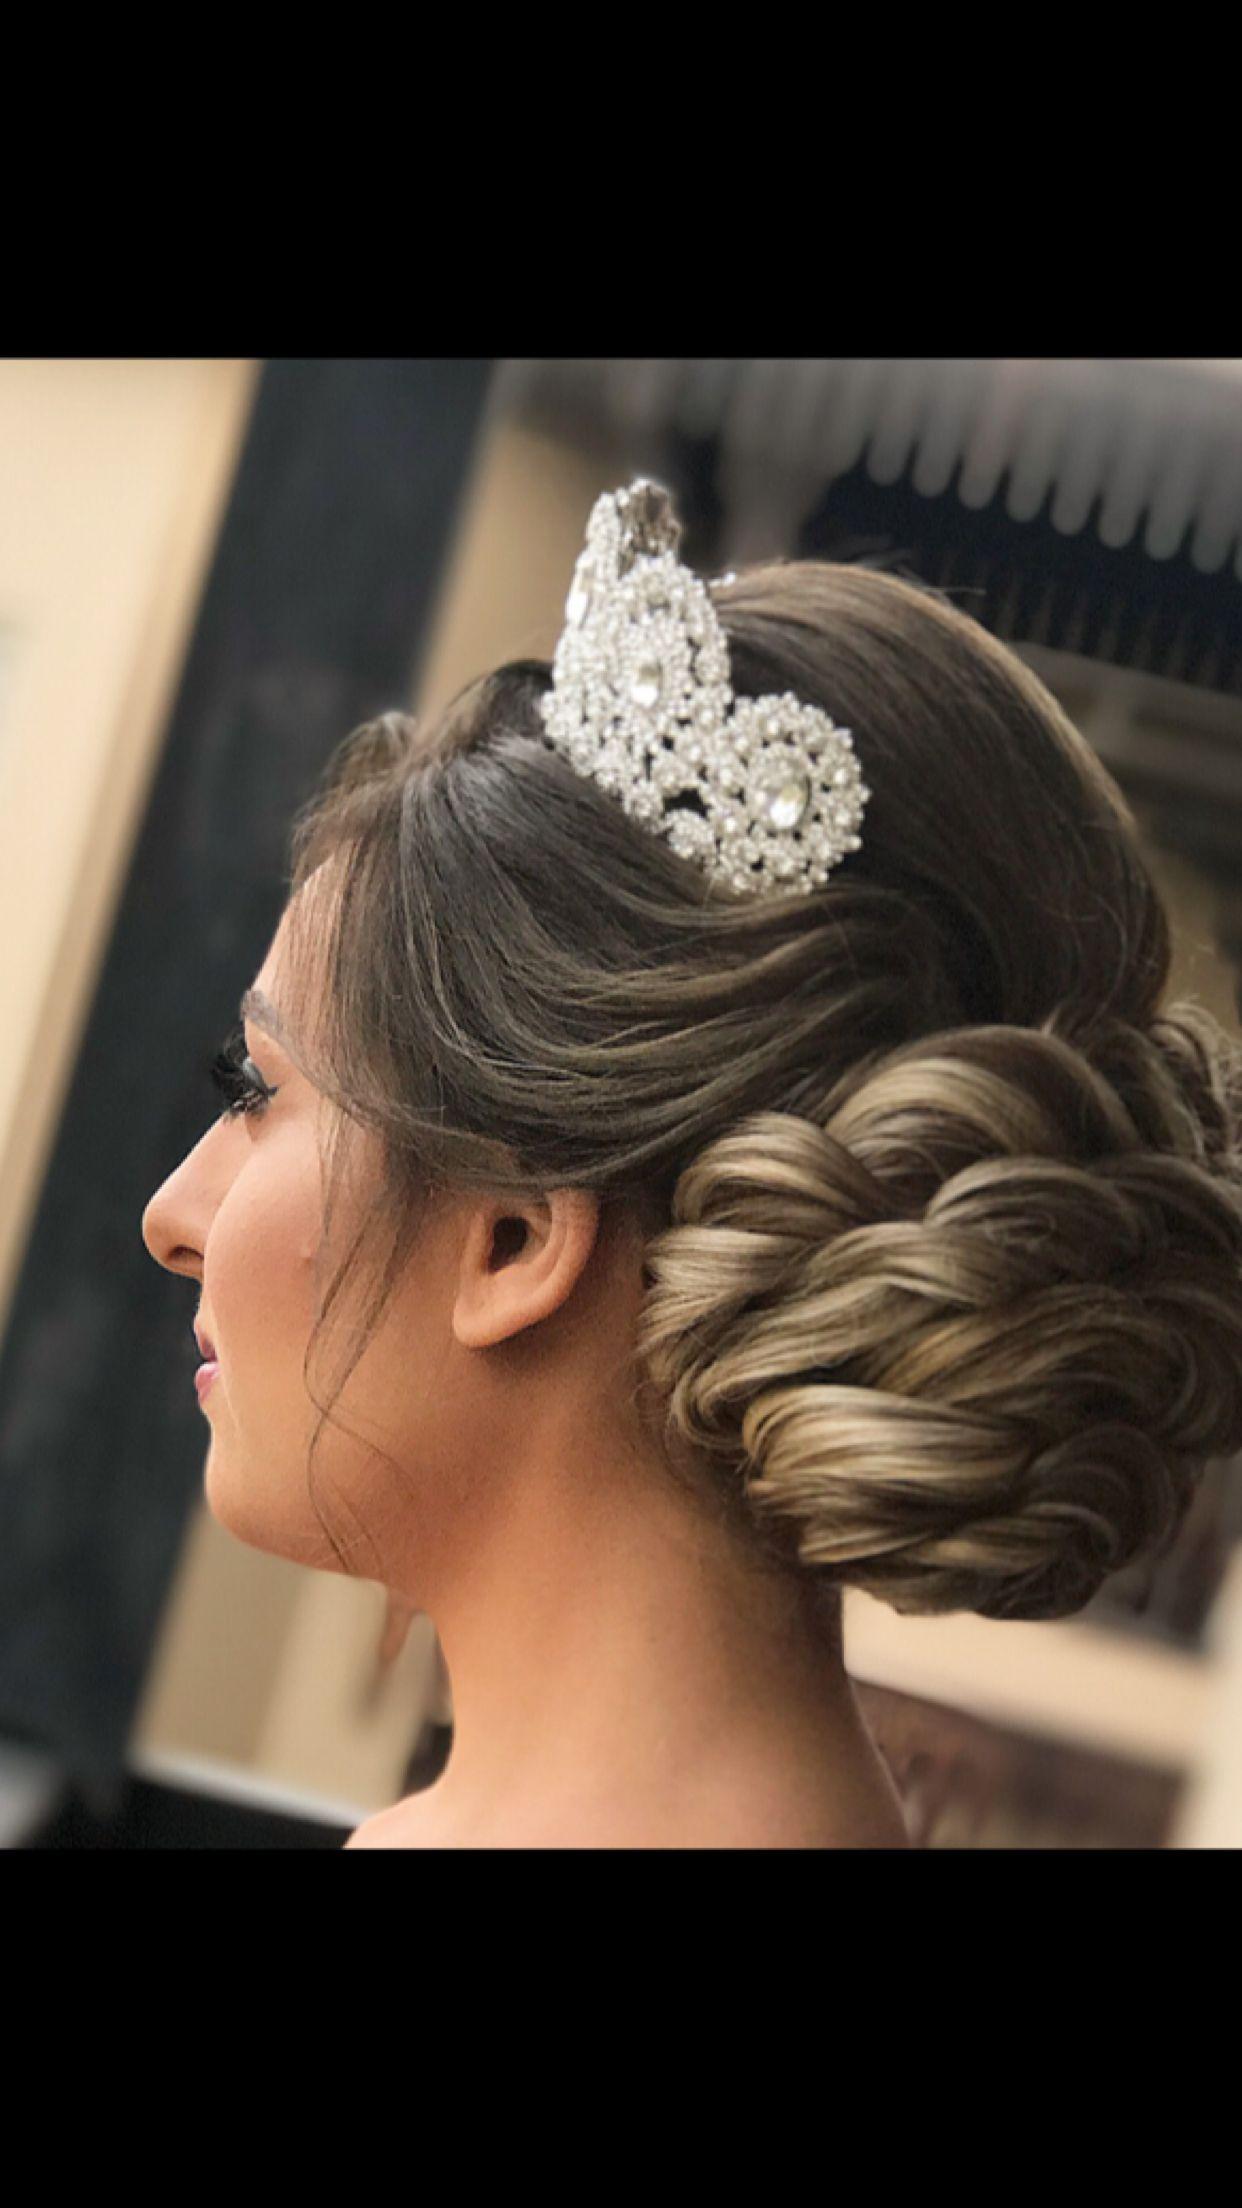 hair #bride #andrew_kassemkhalil #fashion #style #hairstyle